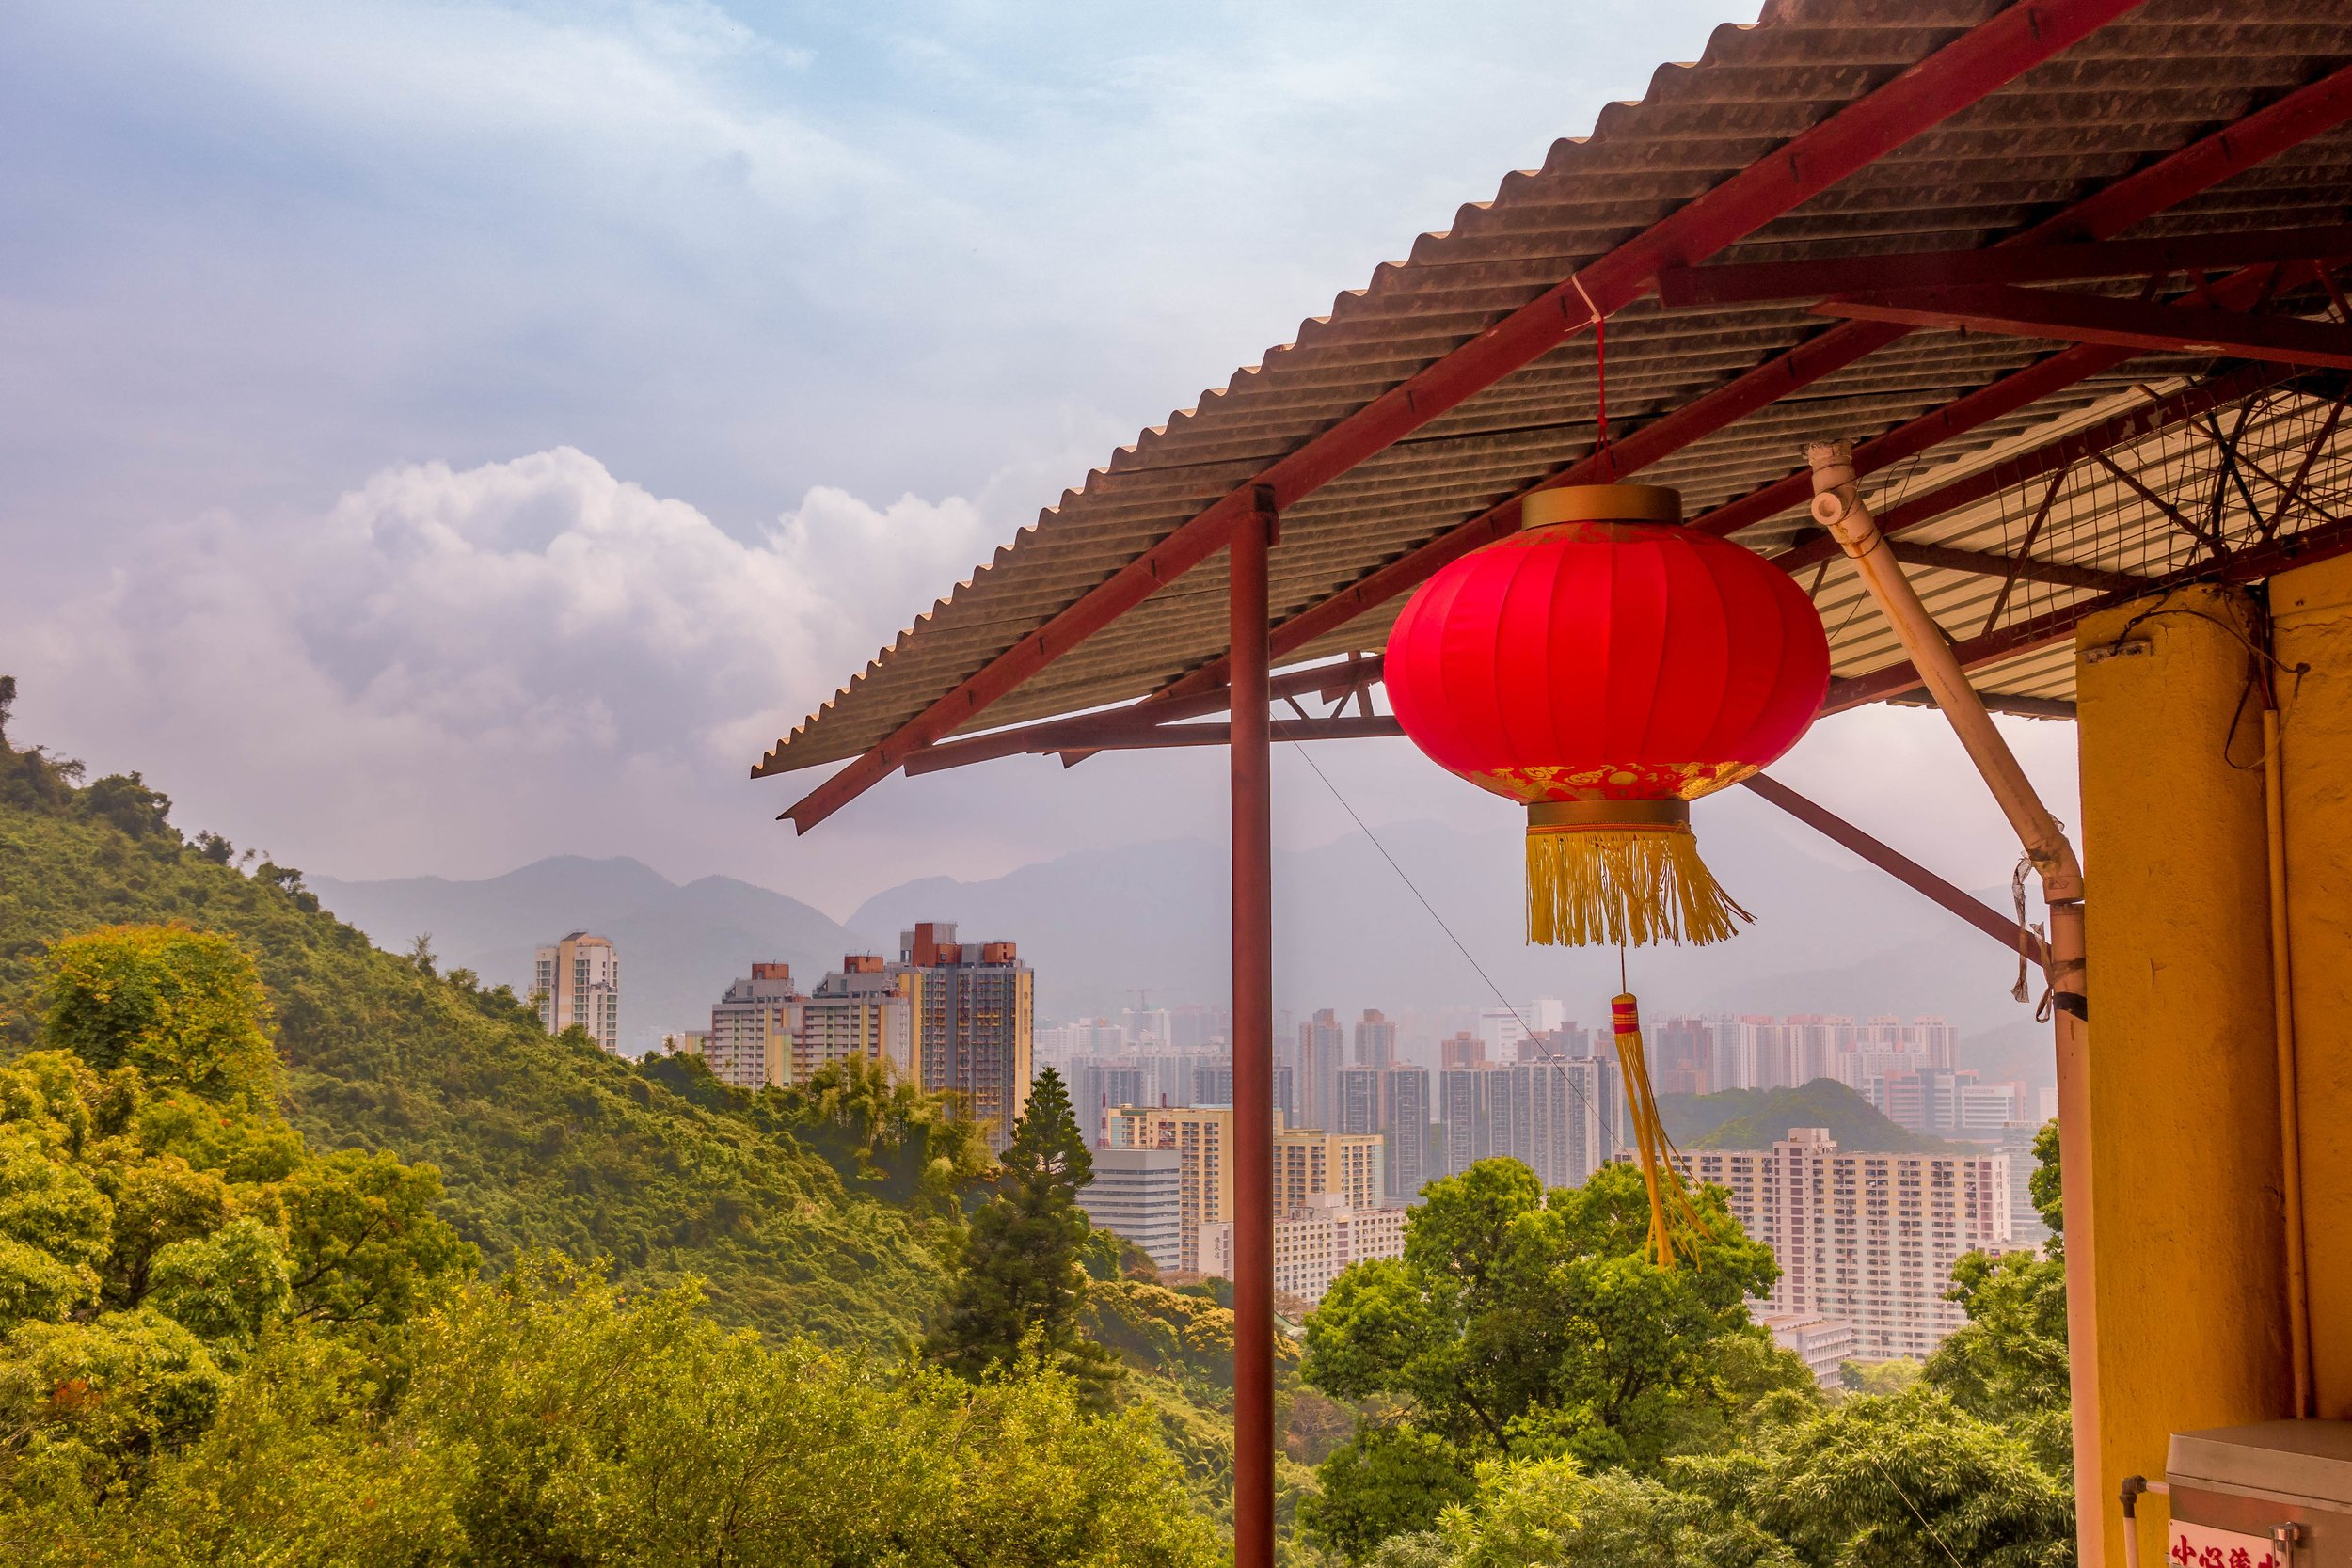 Temple-High-Rises_Hong-Kong_Ben-Silverman